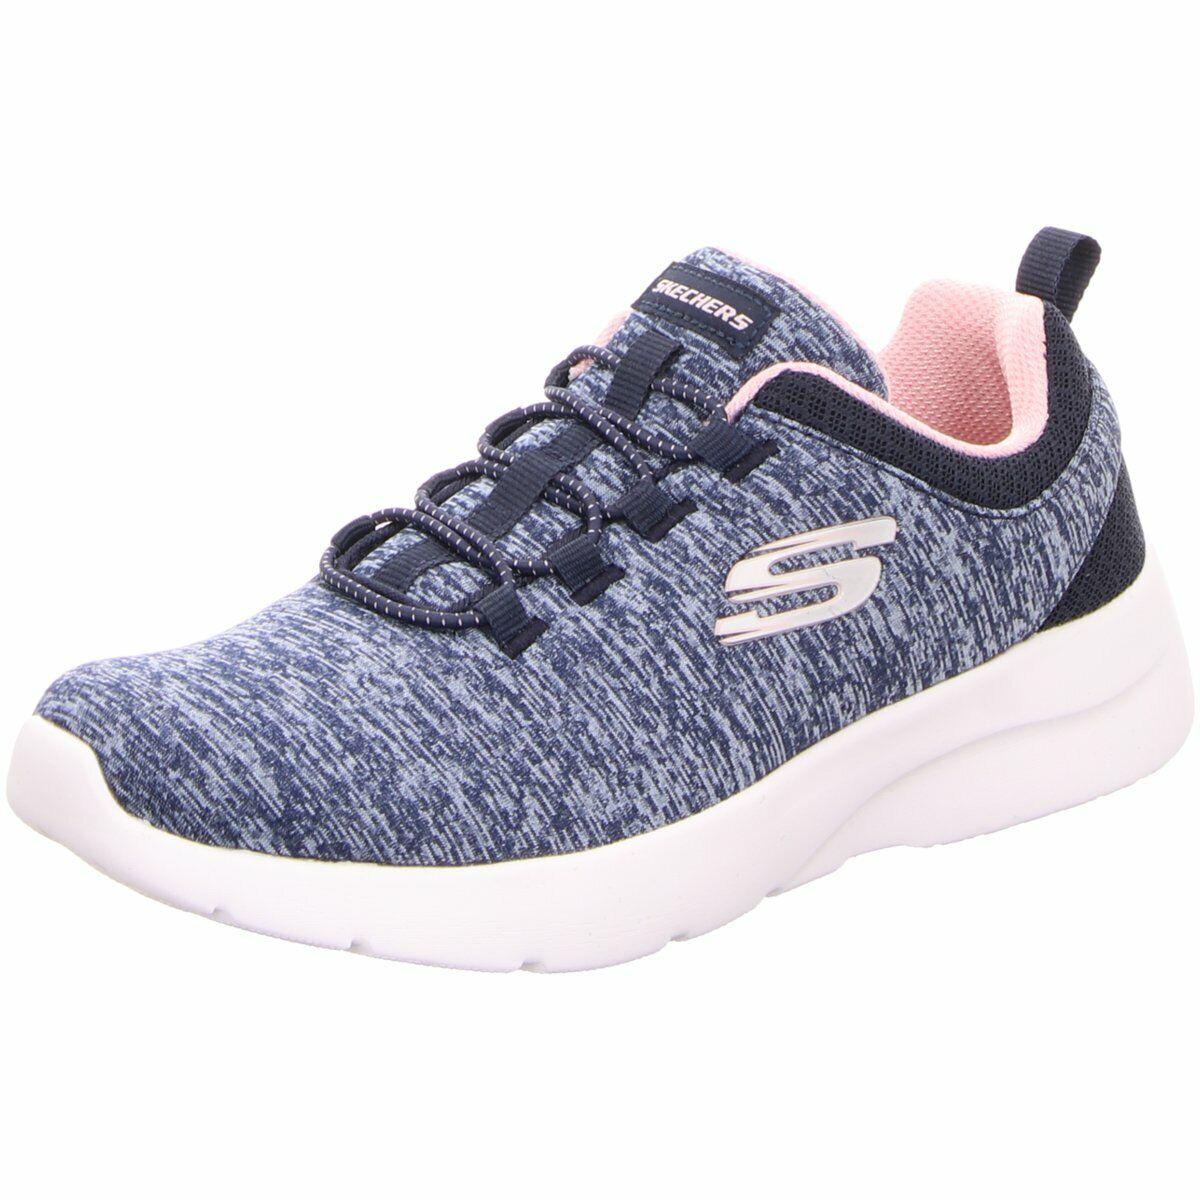 Skechers Damen Sportschuhe Slip on 12695//NVPK blau 547133